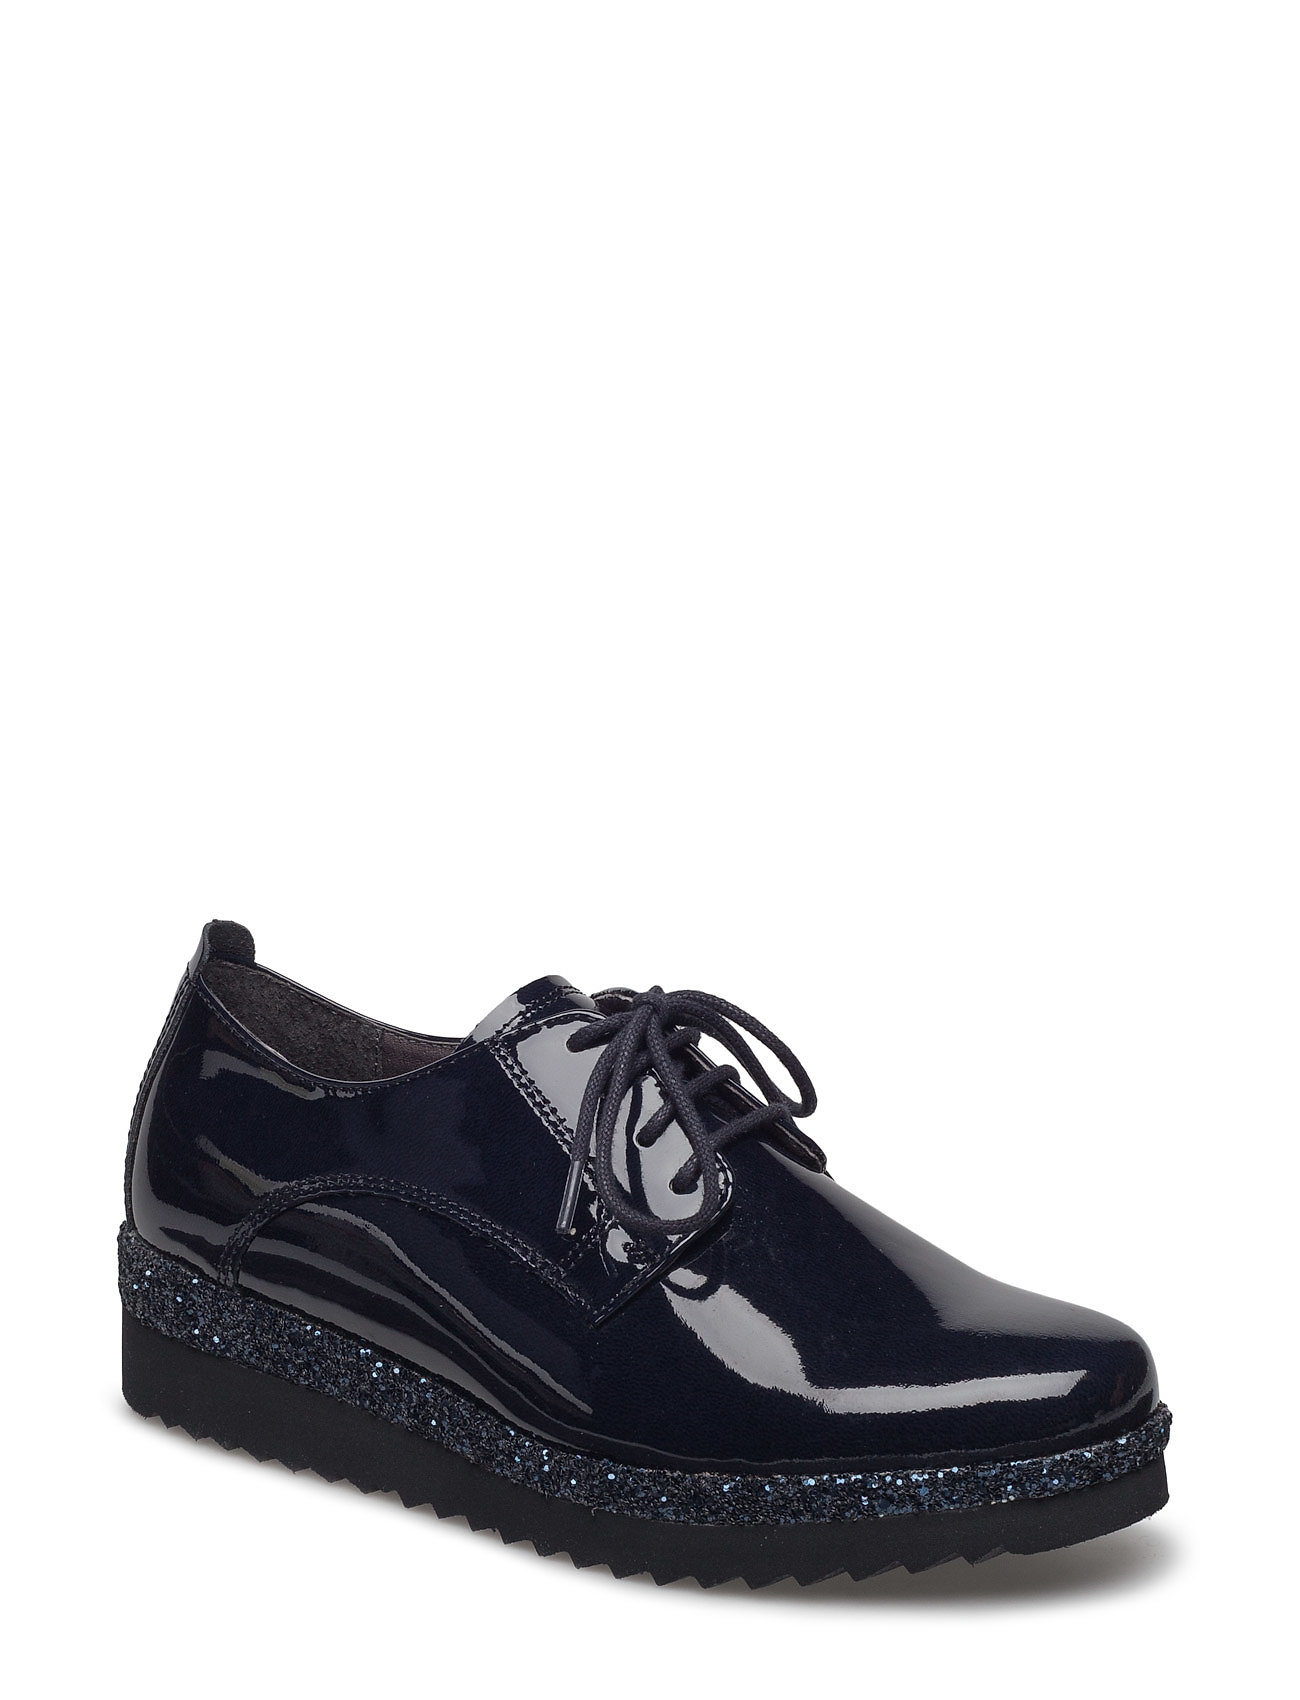 gabor – Loafer på boozt.com dk